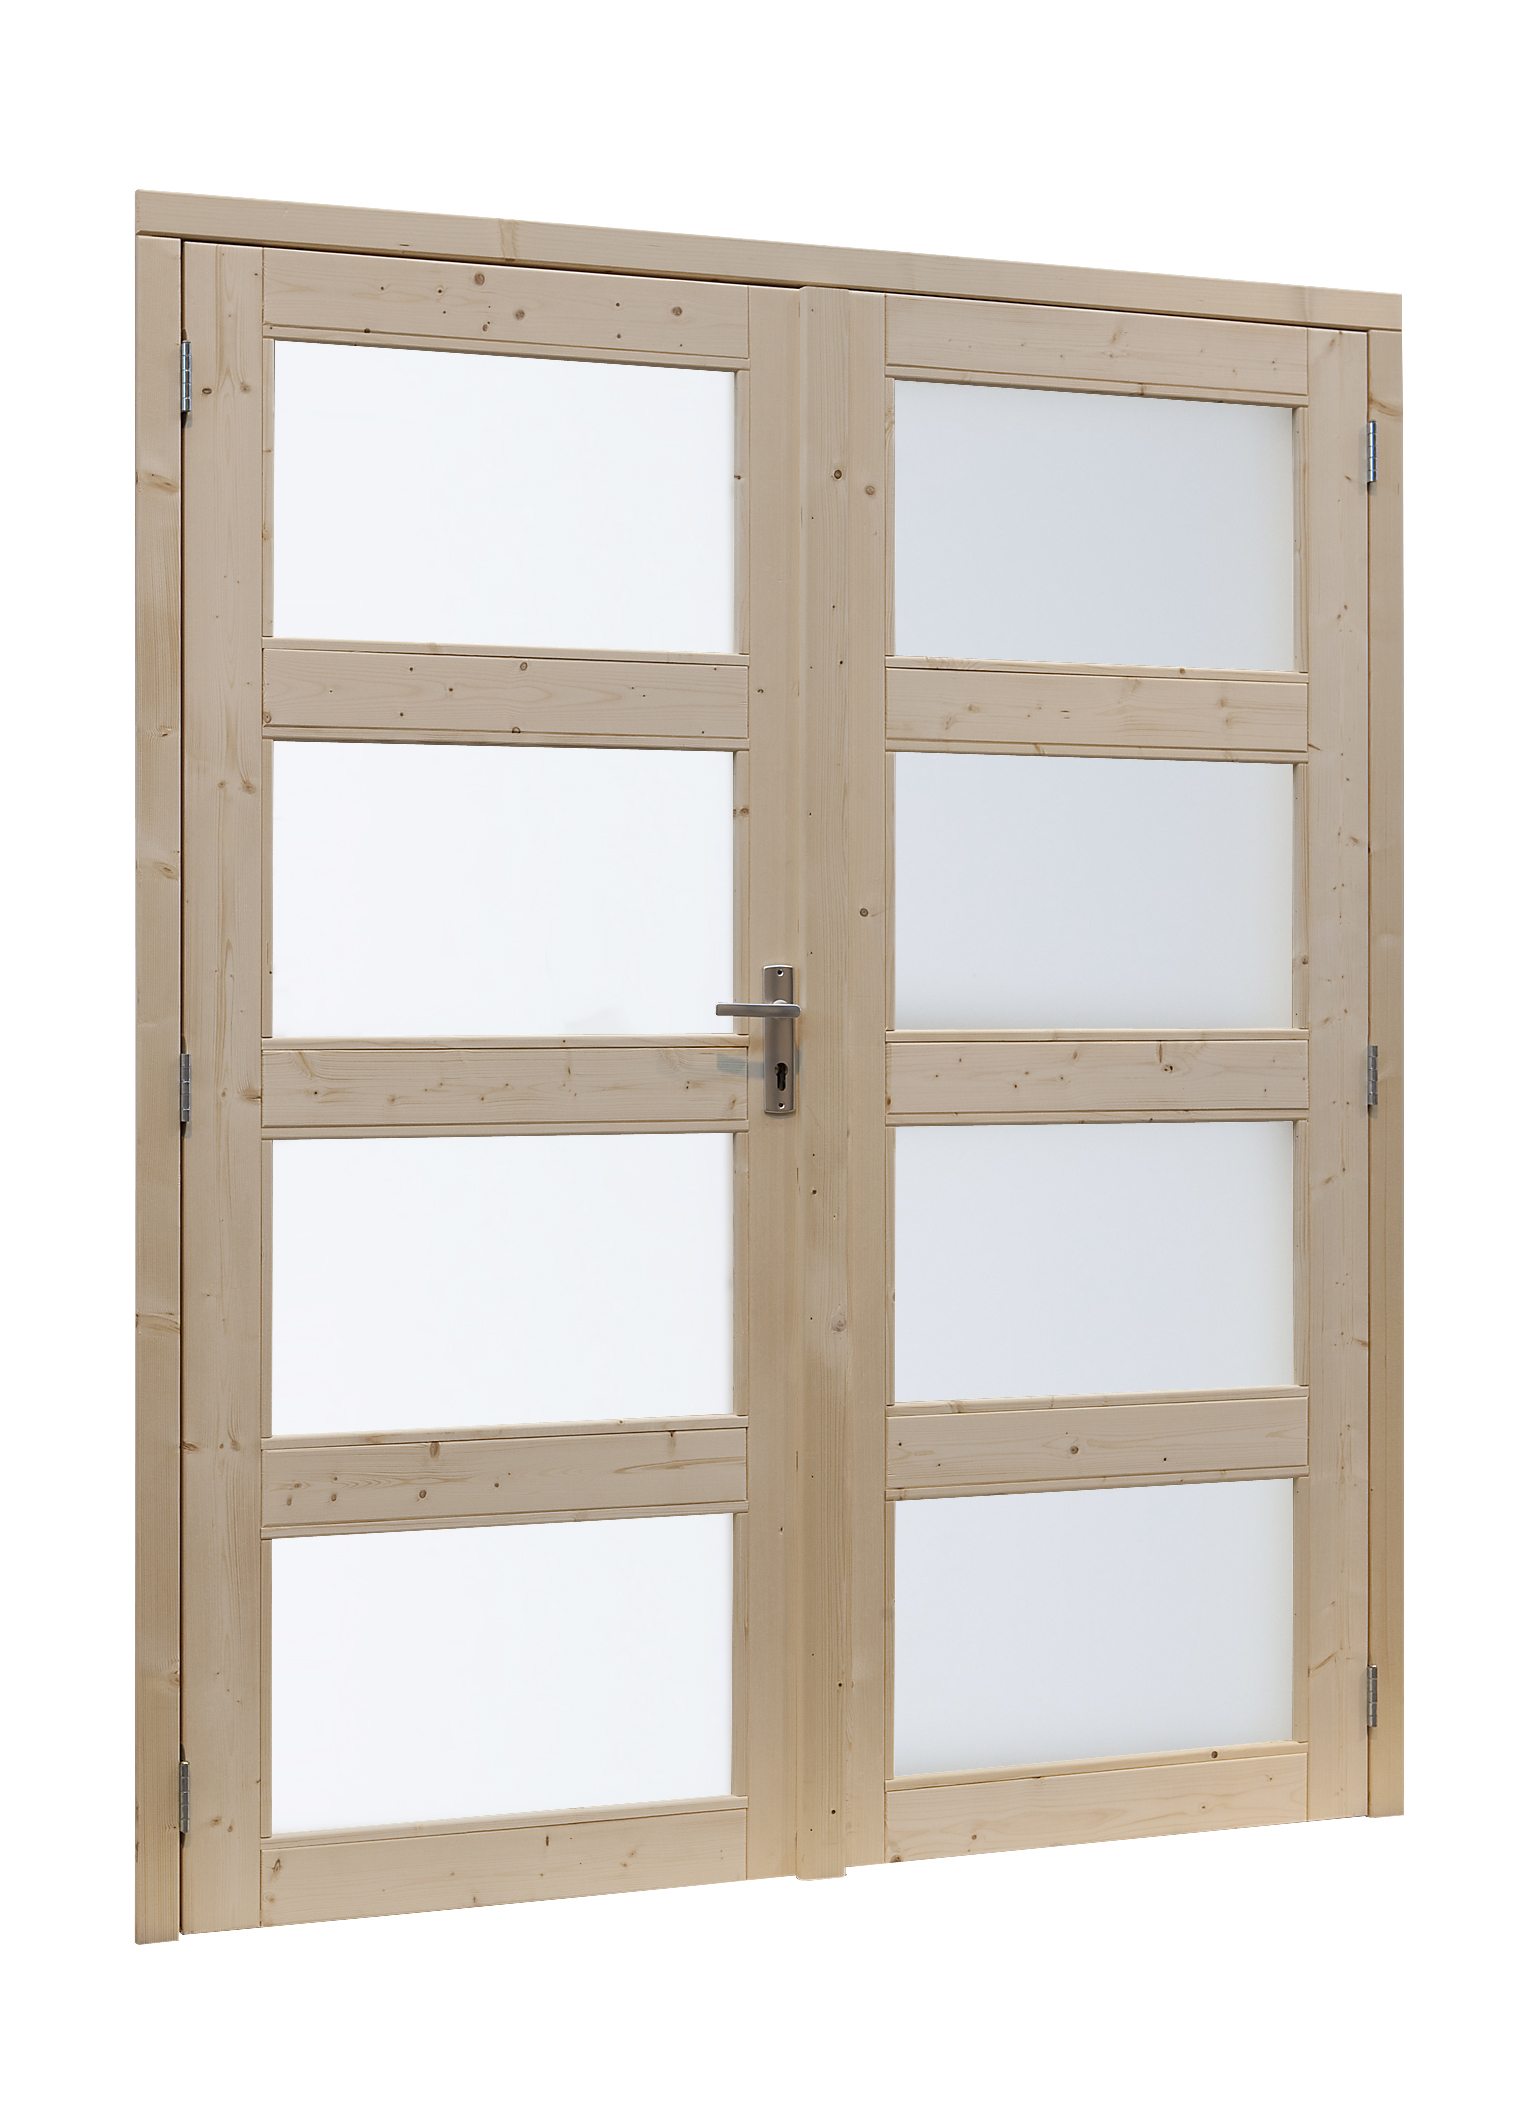 Woodvision   Vuren dubbele glasdeur 4-ruits   Geïmpregneerd groen